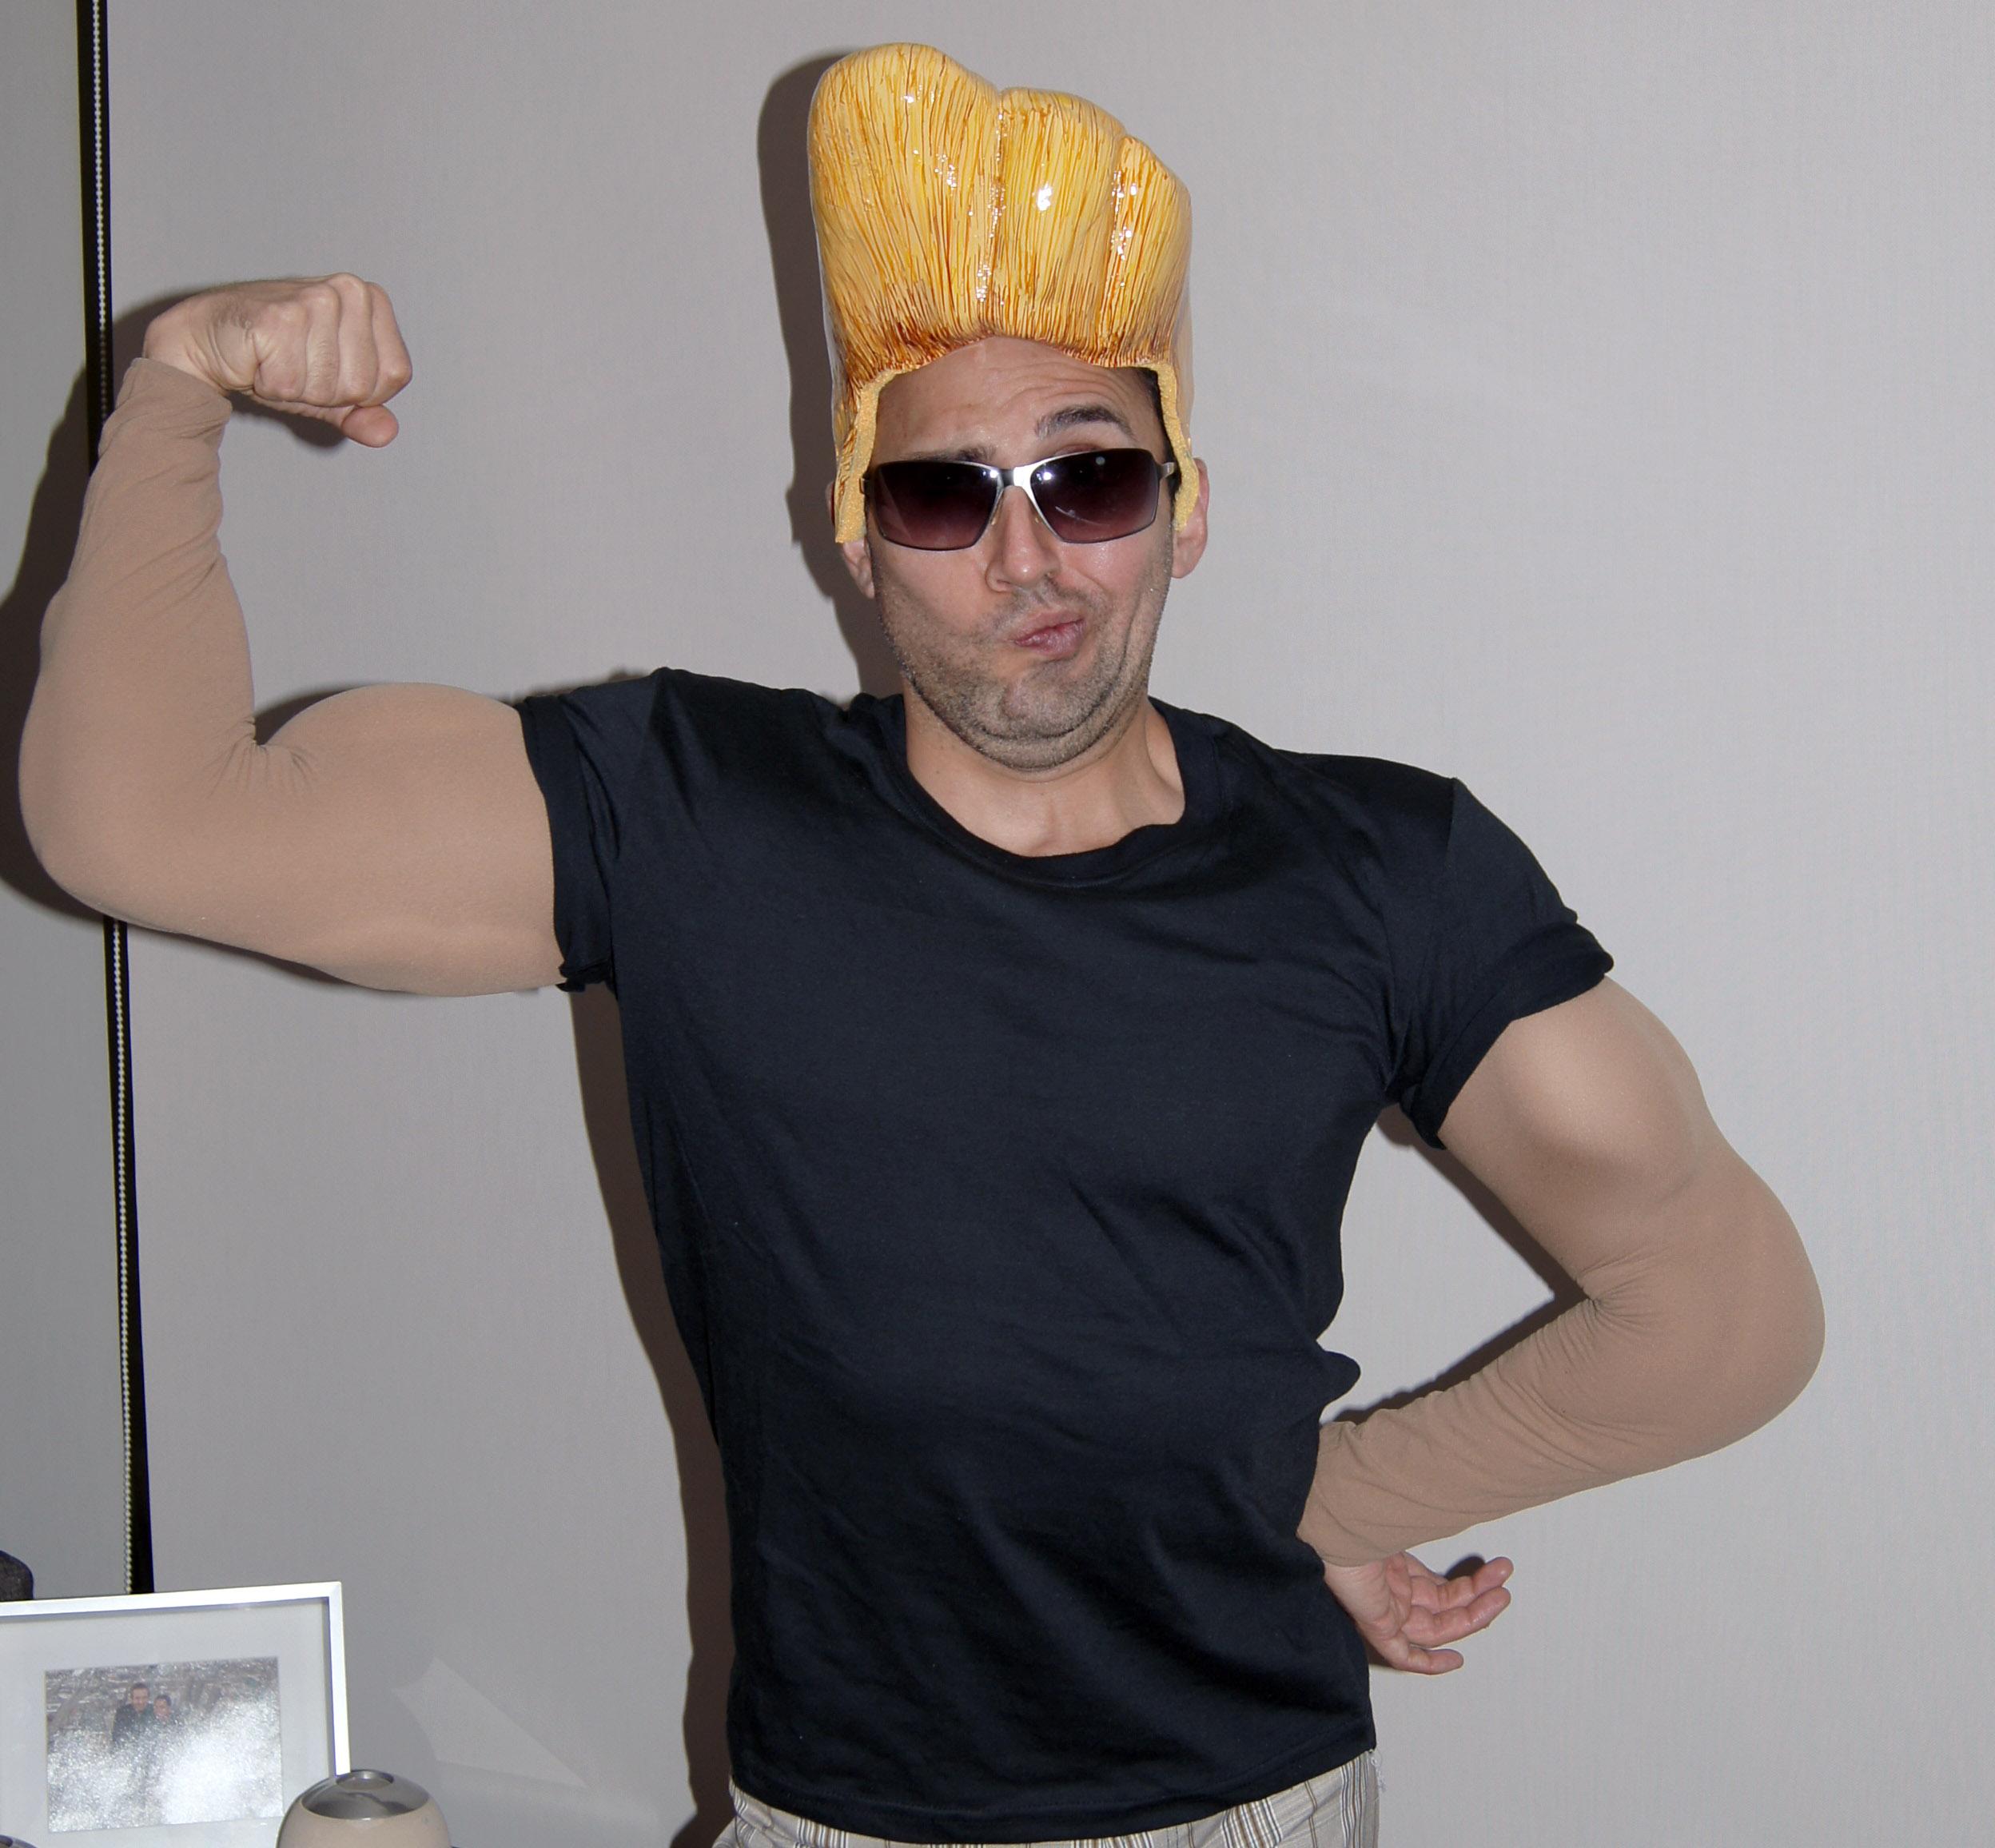 Johnny Bravo Costume Sewing Projects Burdastyle Com